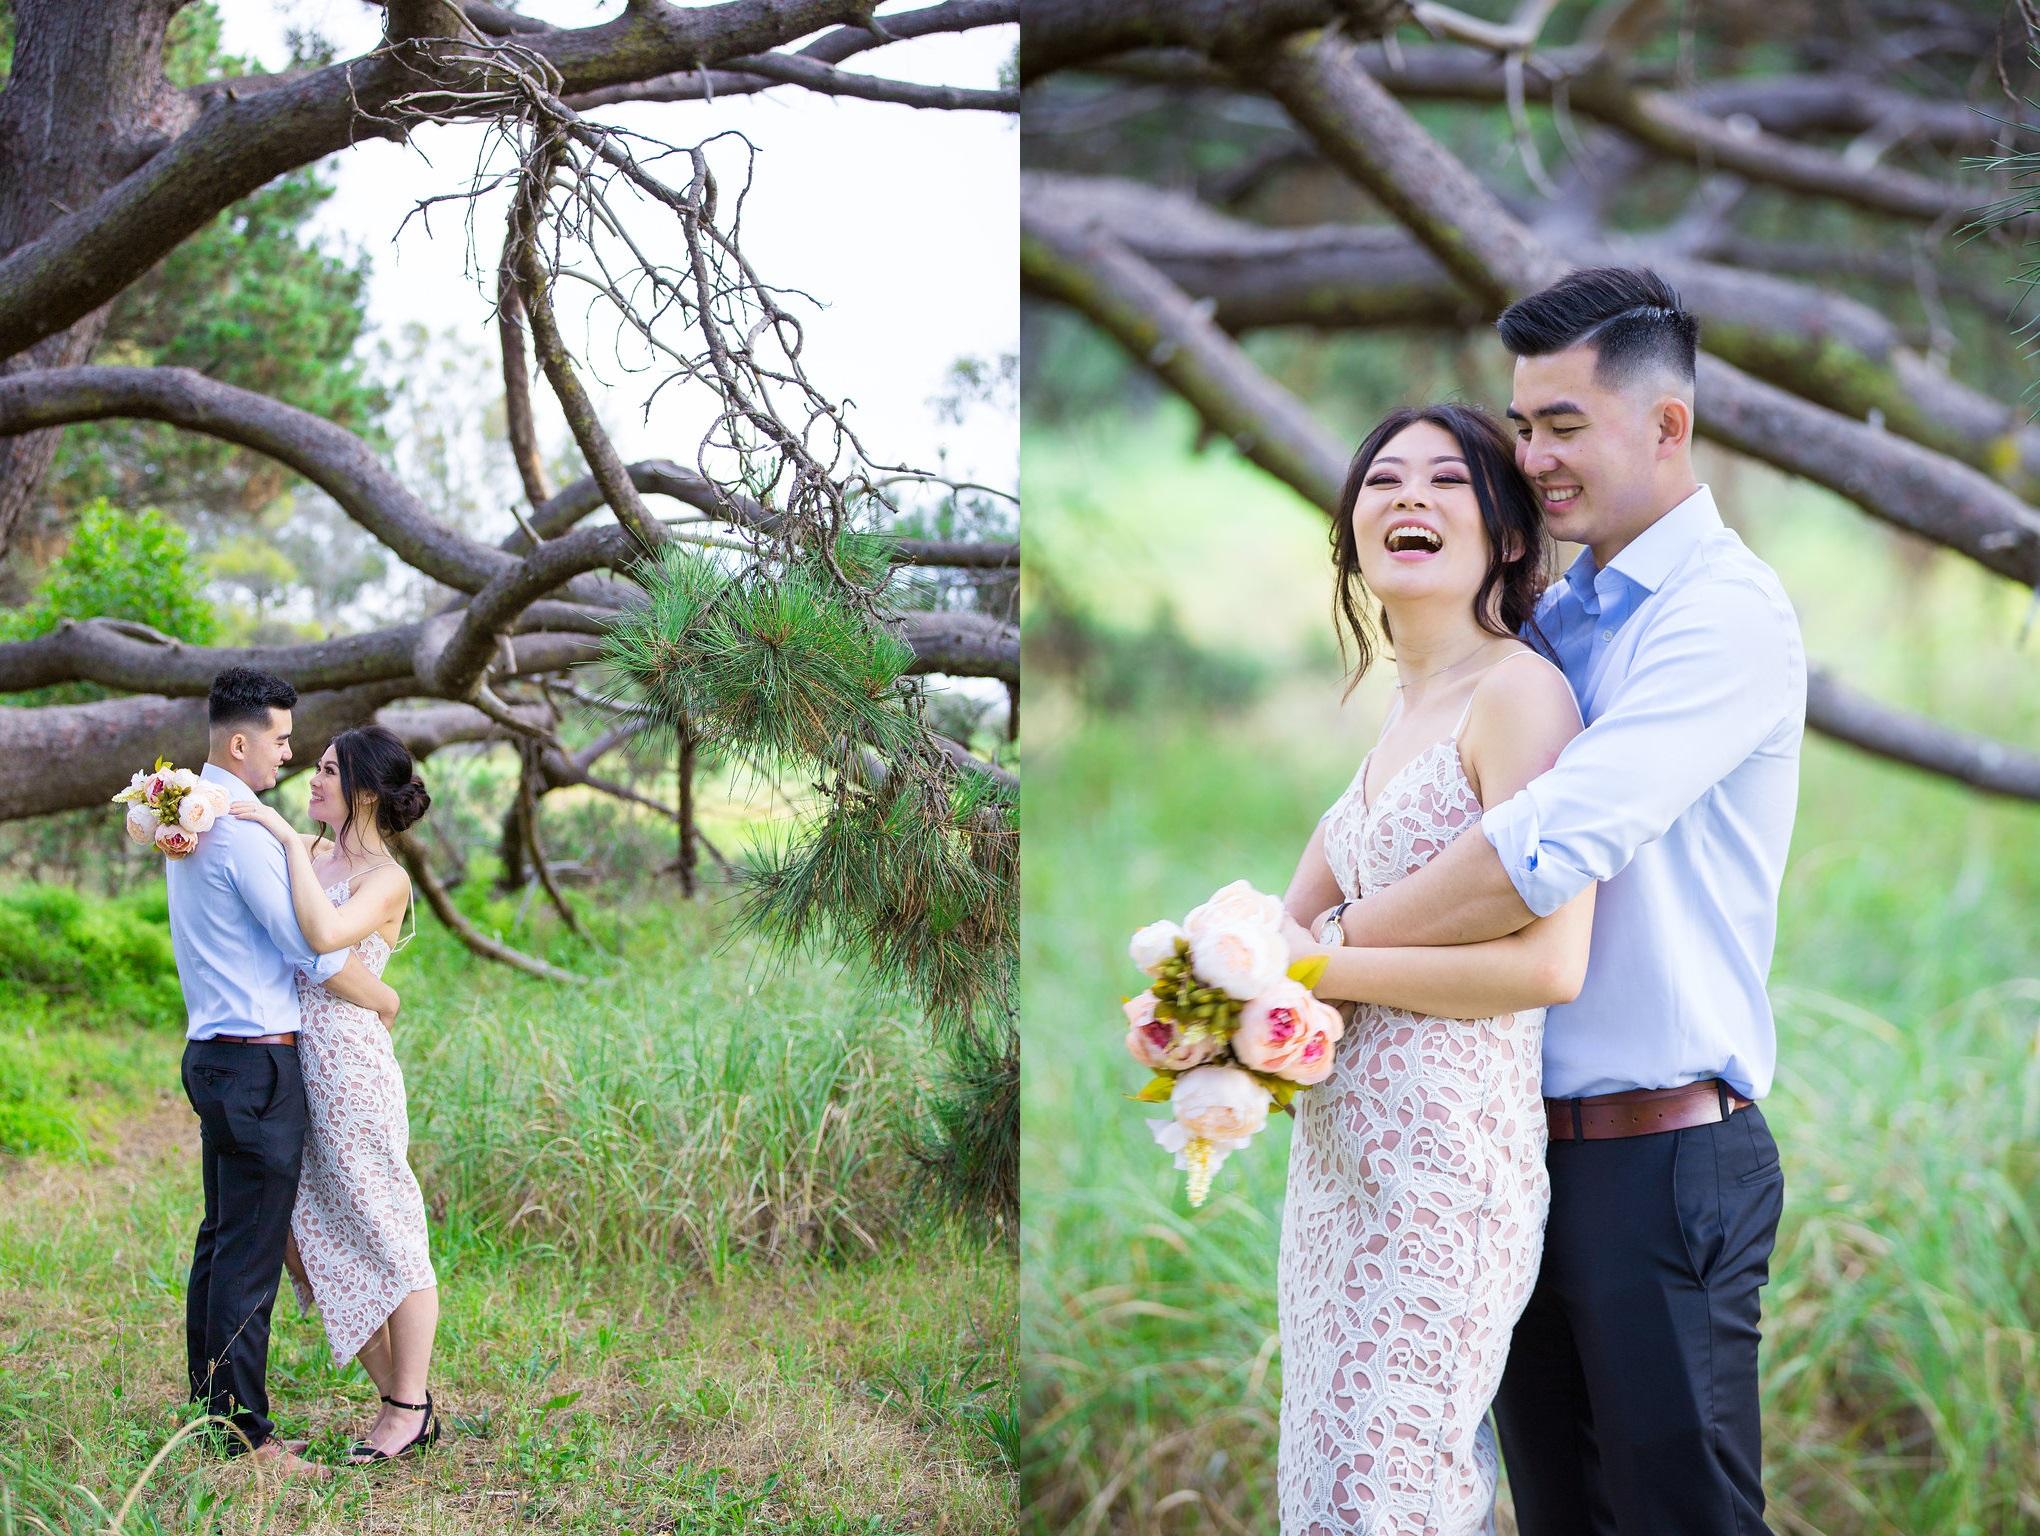 Sydney Professional Wedding Photographer - Asian Weddings - Jennifer Lam Photography - Centennial Parklands (28).jpg